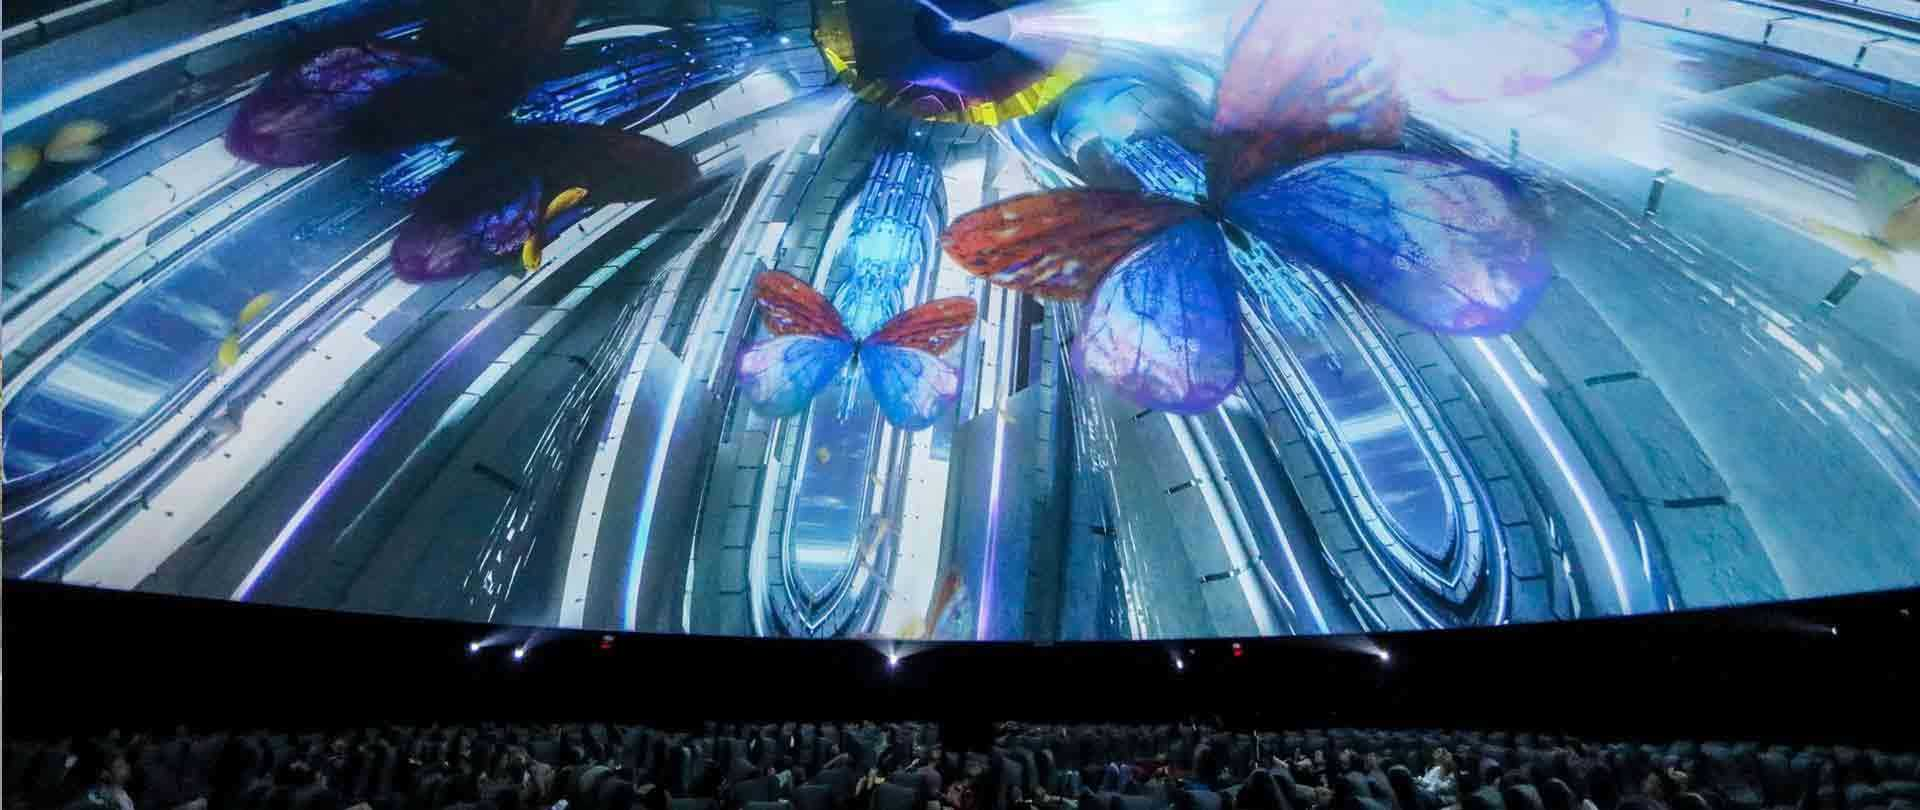 120ft Coachella Projection Dome